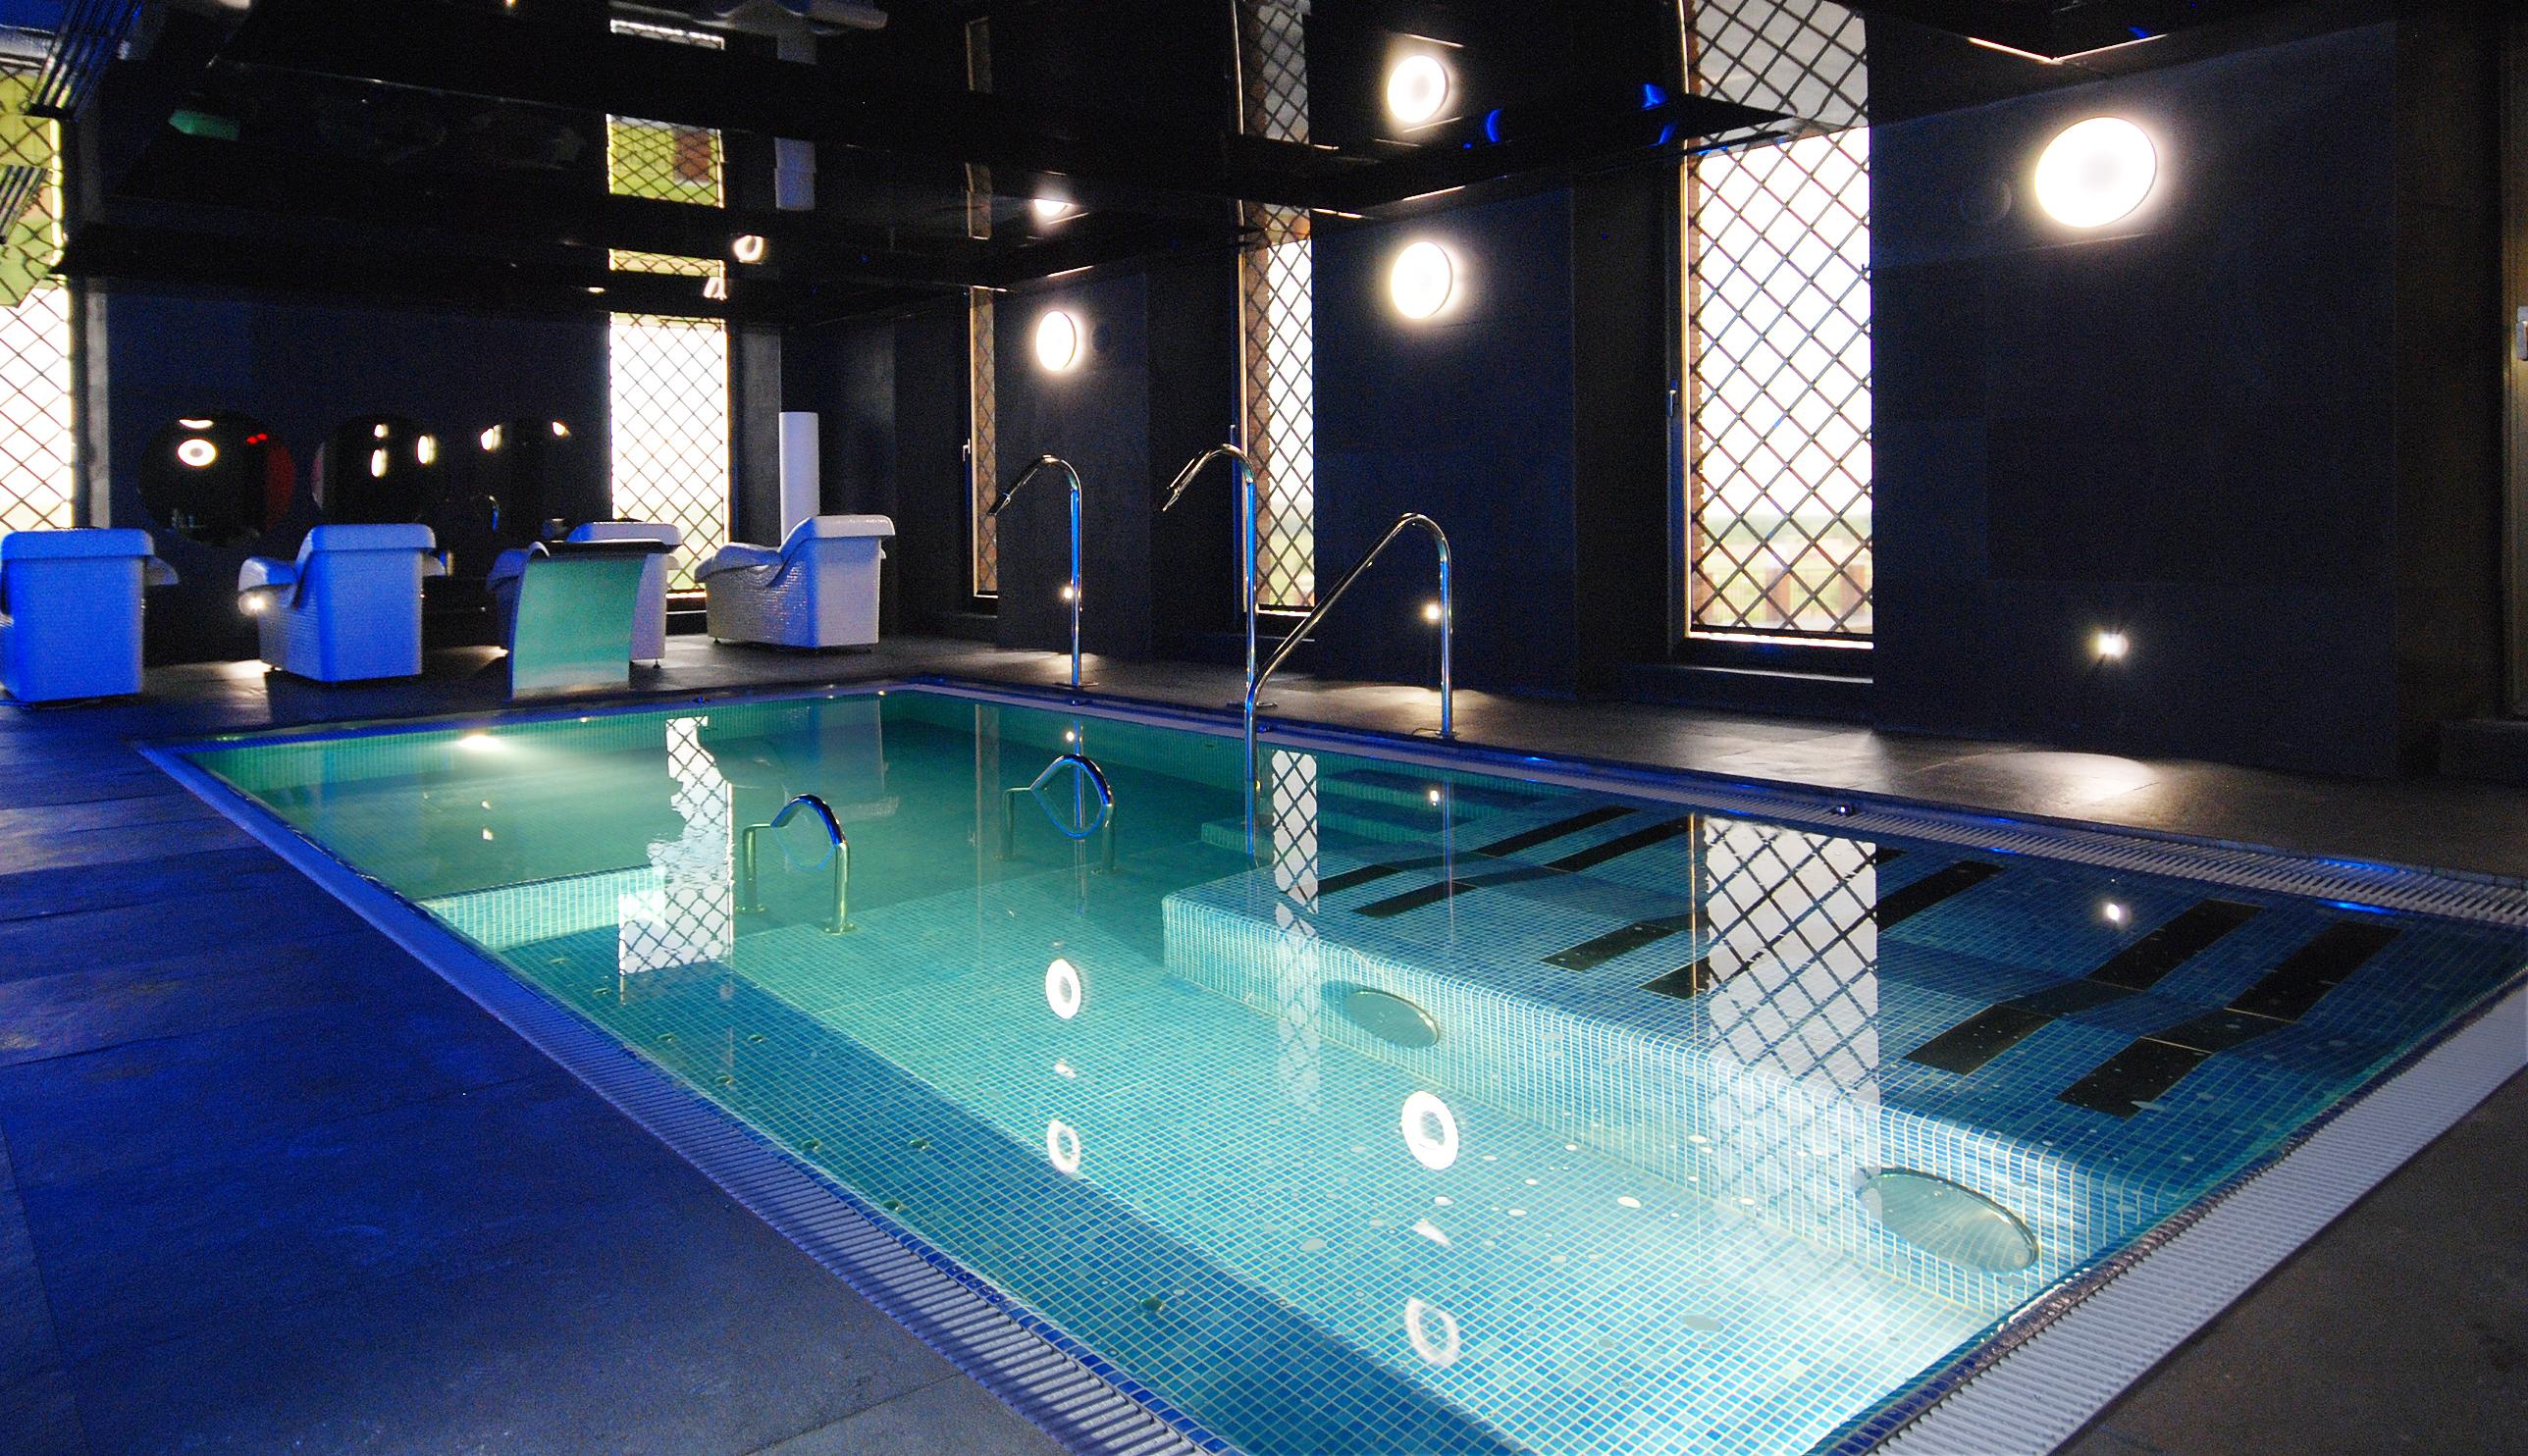 Sarl aqua blue europa piscine for Chauffage piscine blue